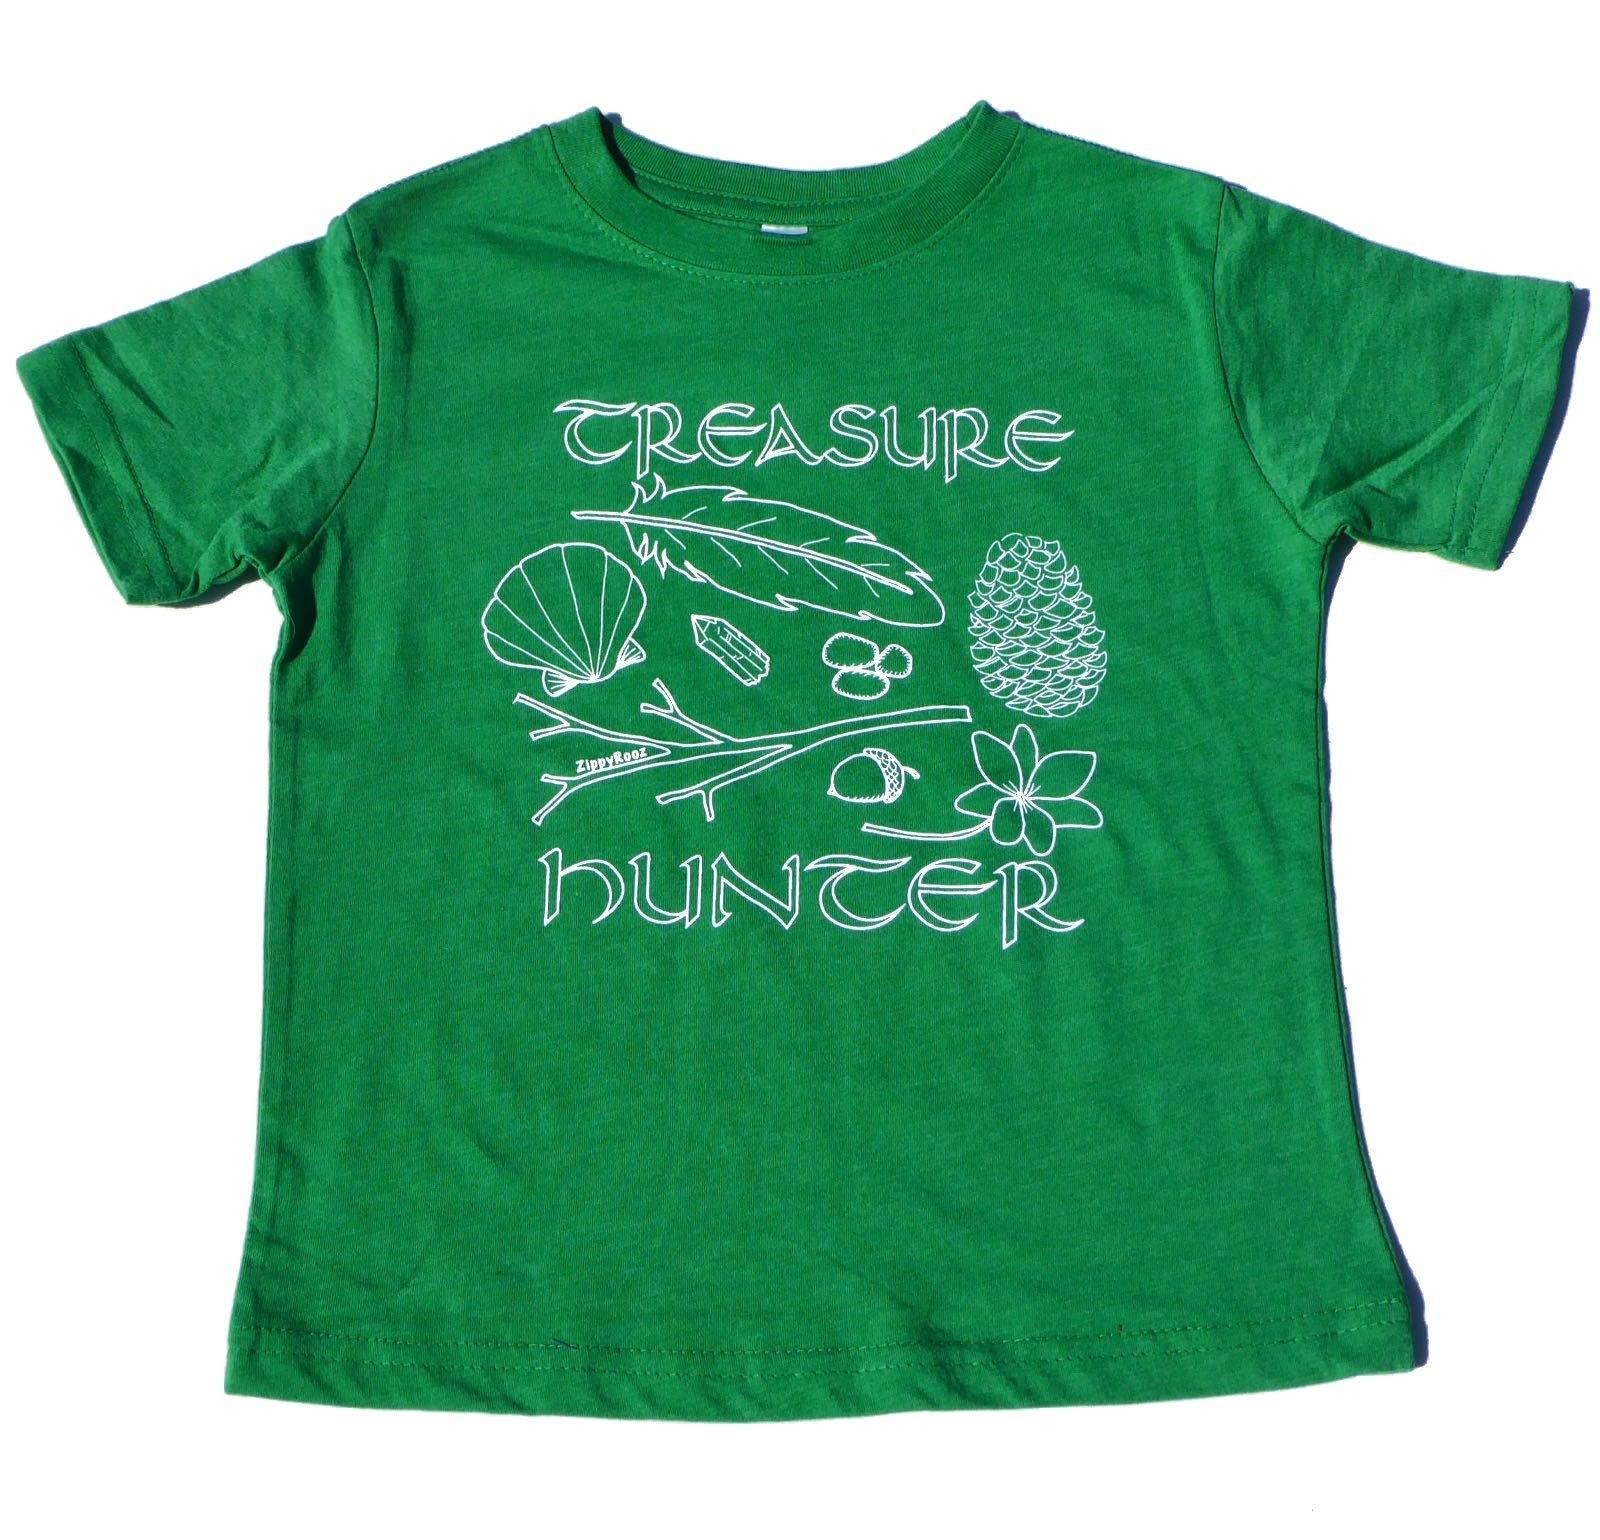 ZippyRooz Boys Toddler & Little Kids Hiking Camping Tee Shirt Treasure Hunter (3T)